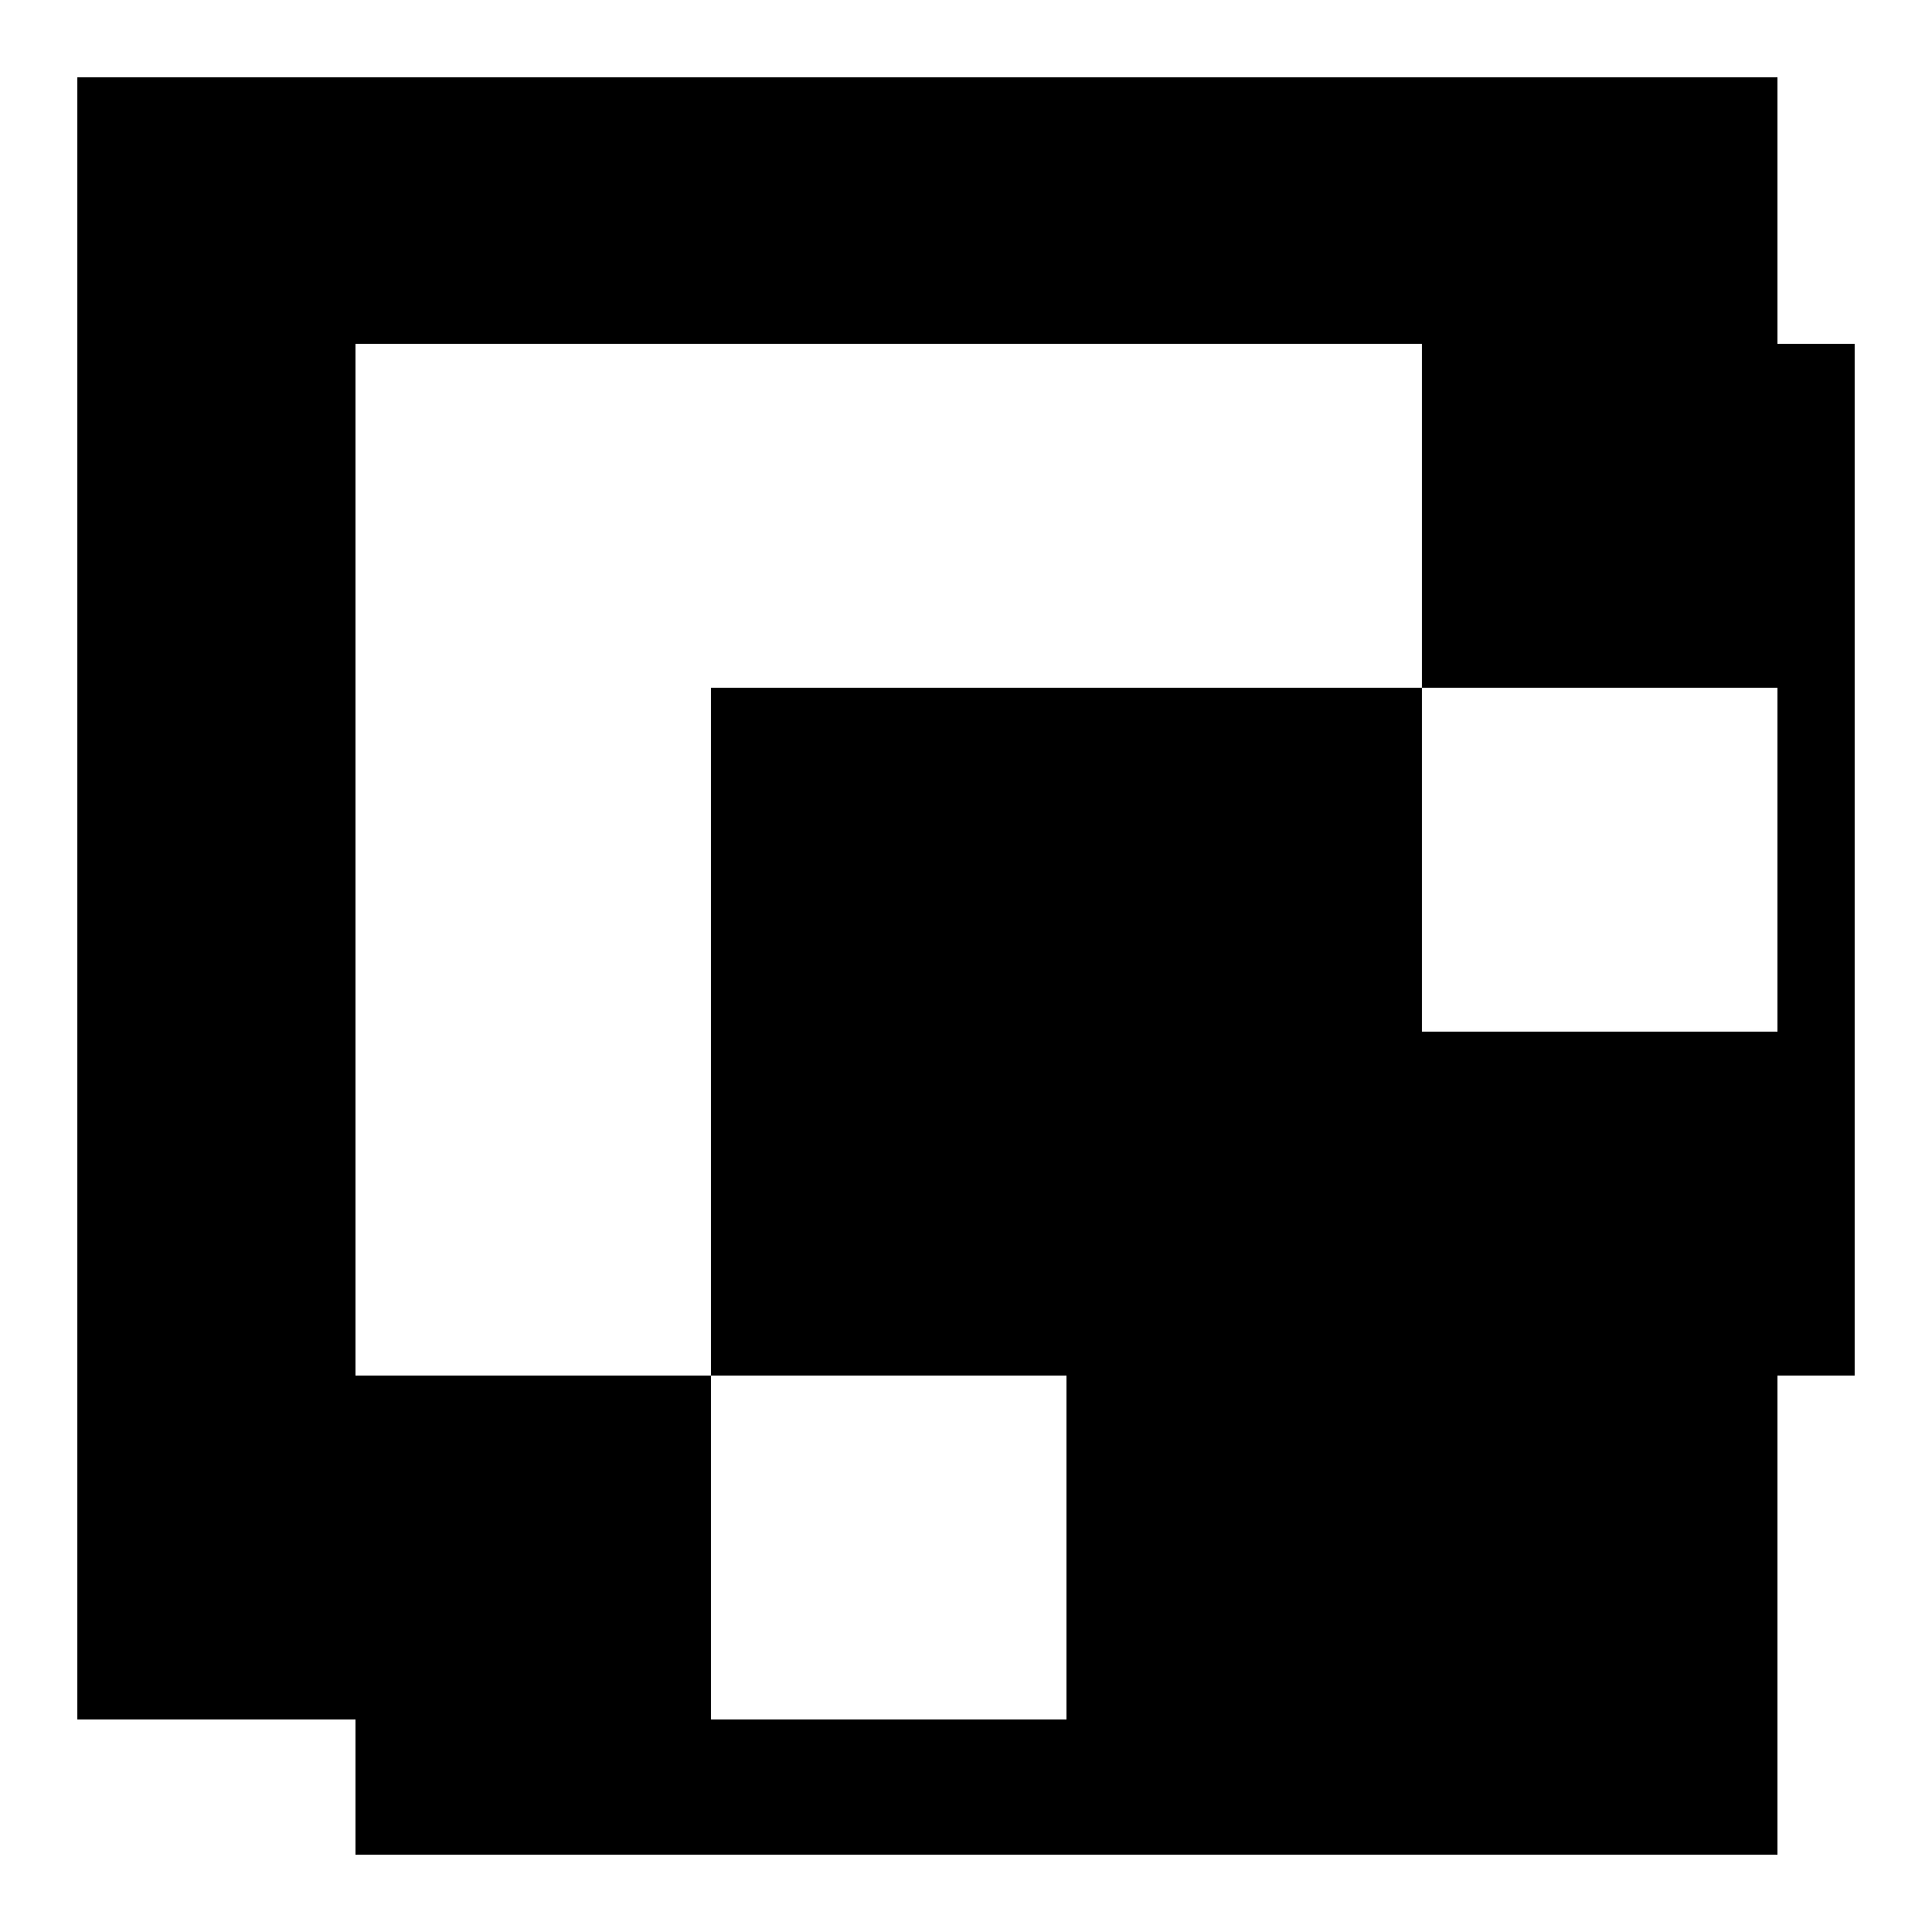 attribute-material-wax